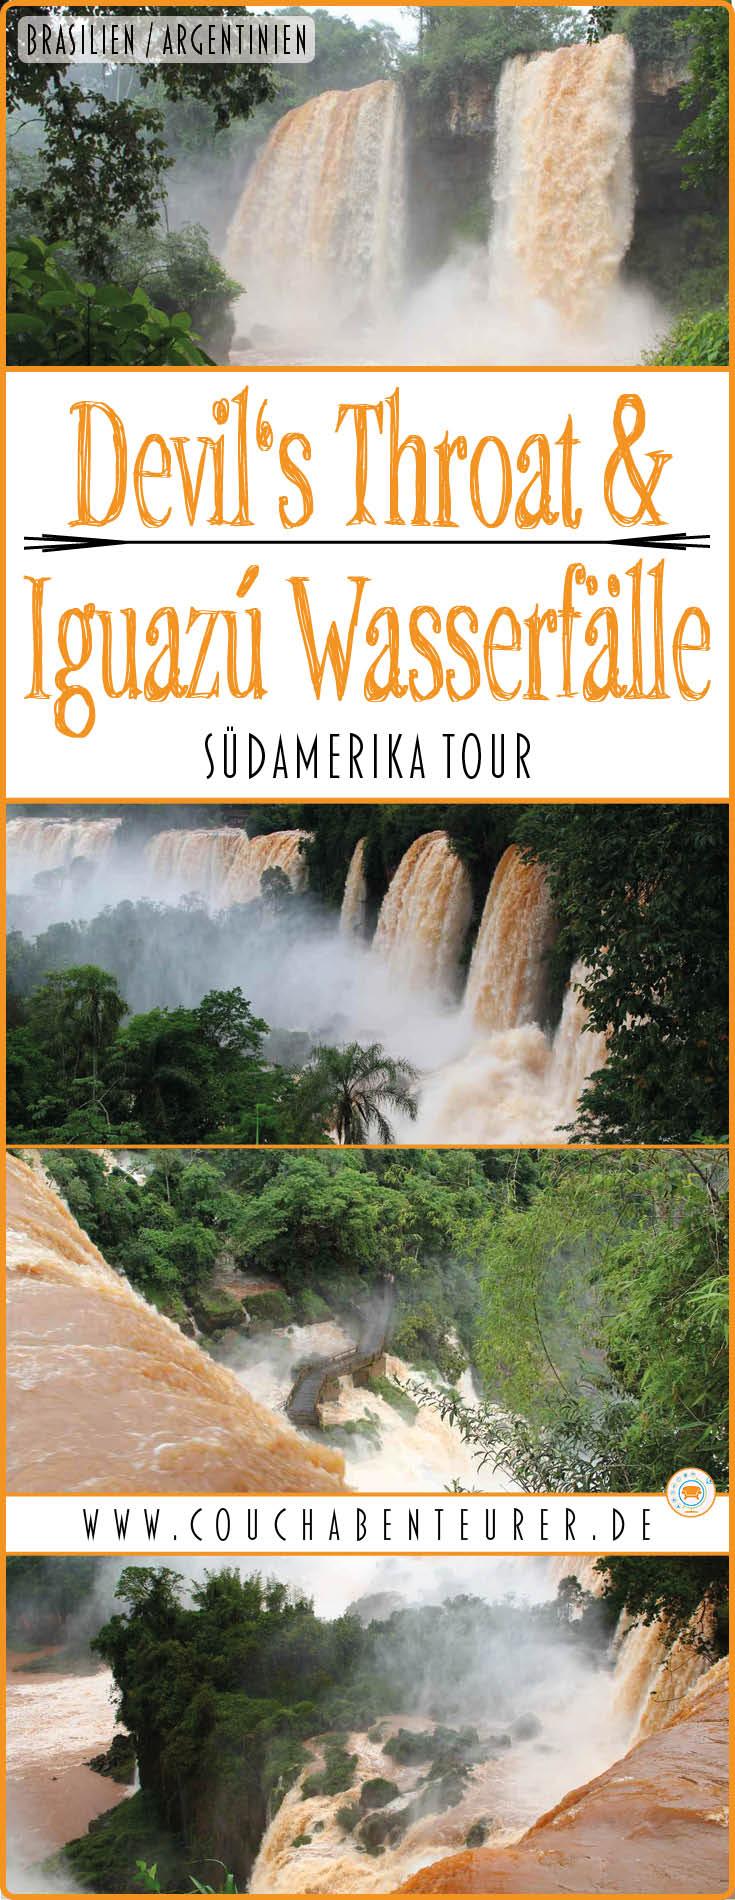 Devils-throat-Iguazú-Wasserfälle